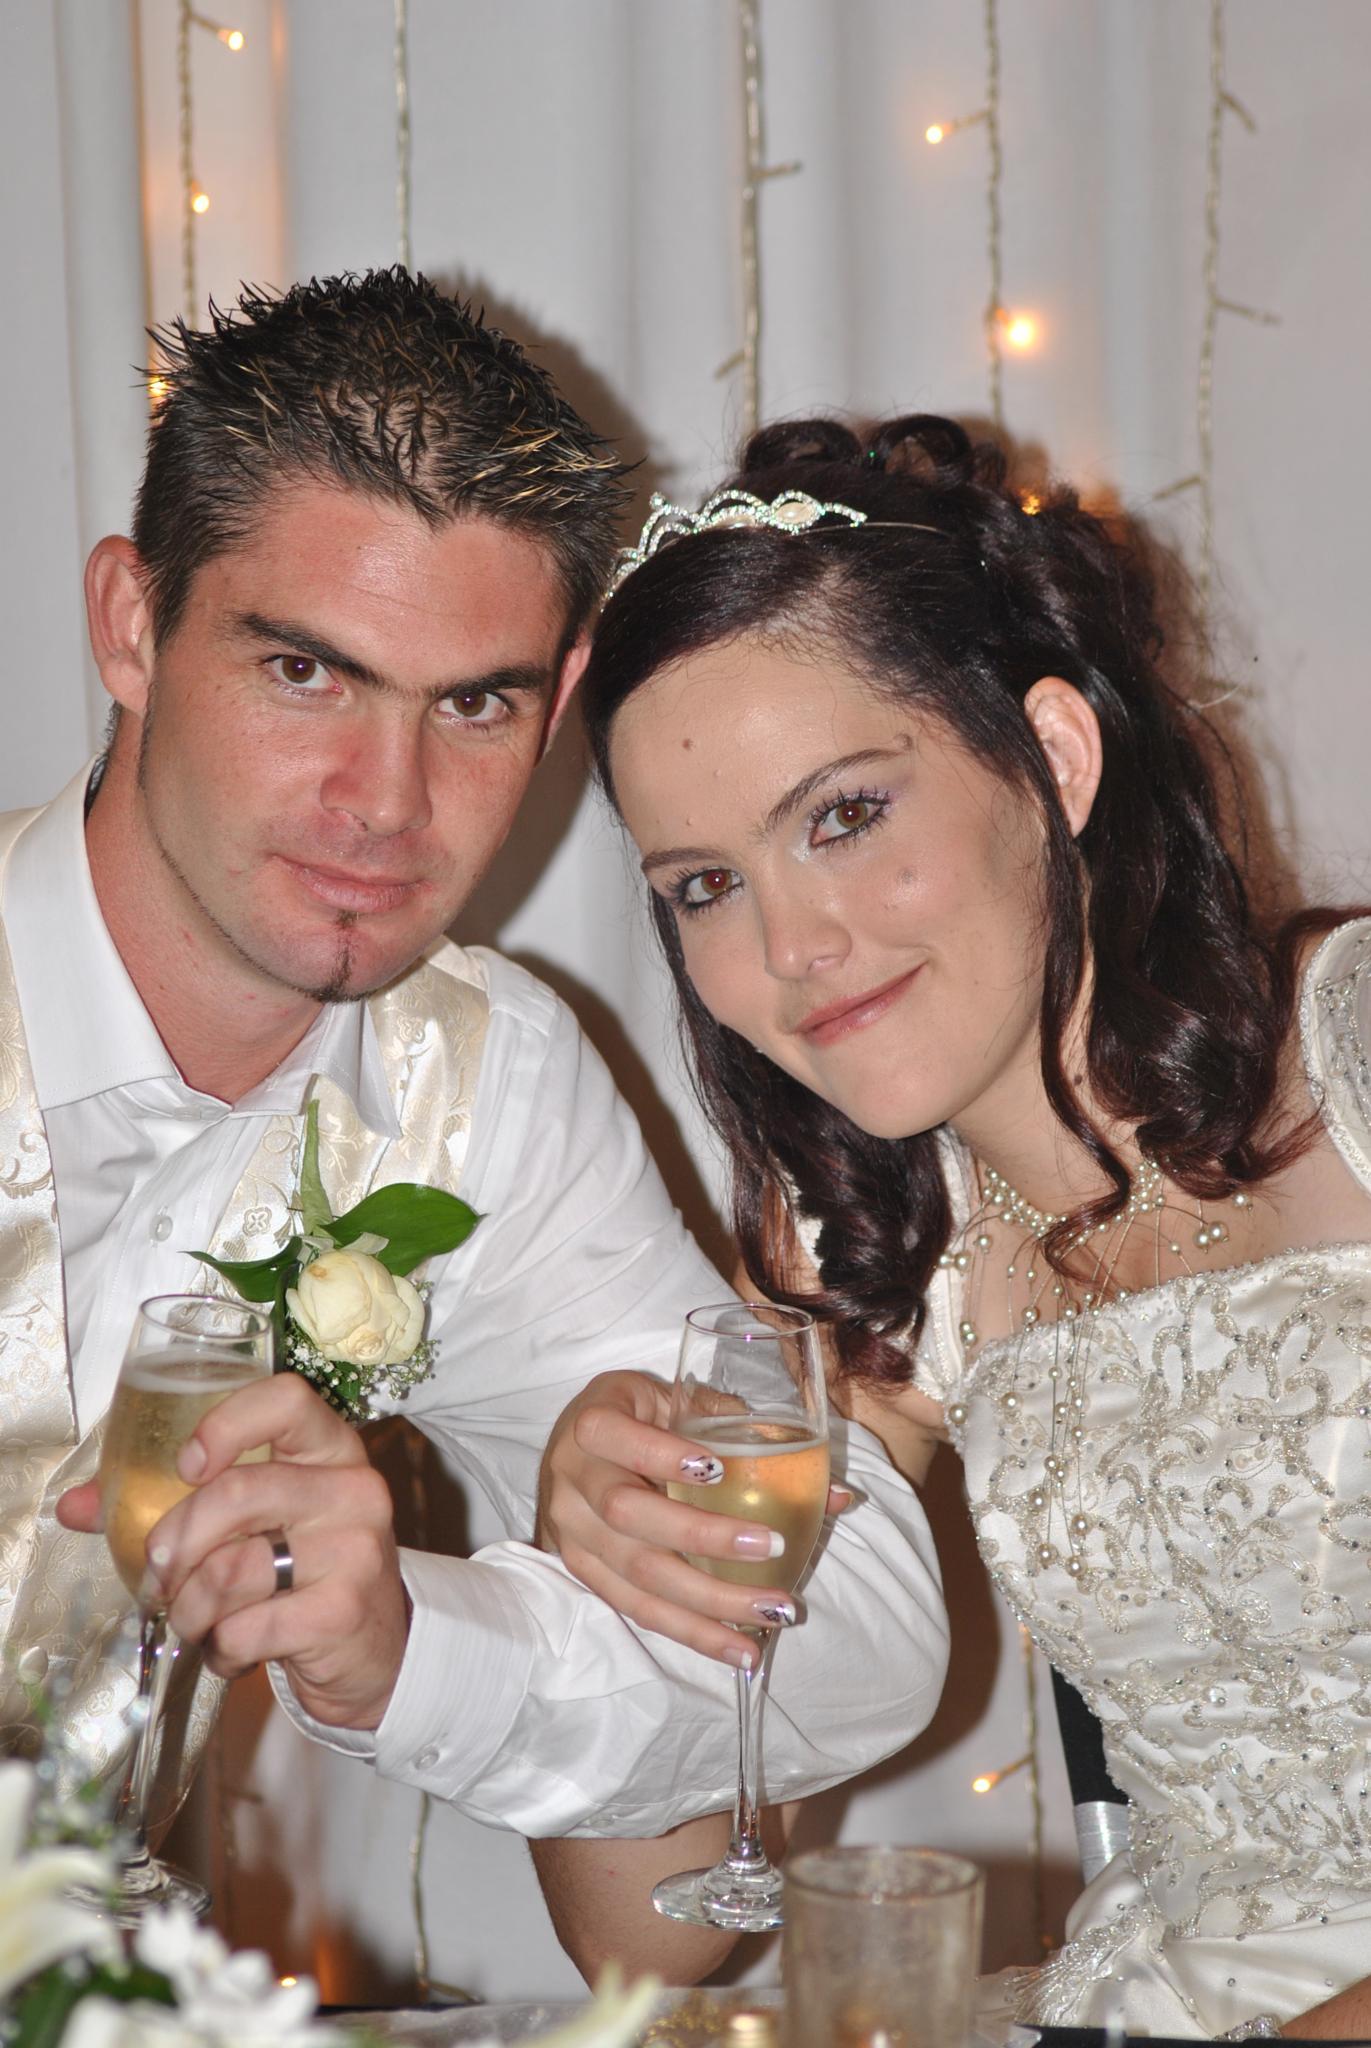 Pietie and Monique wedding by michael.nel.526